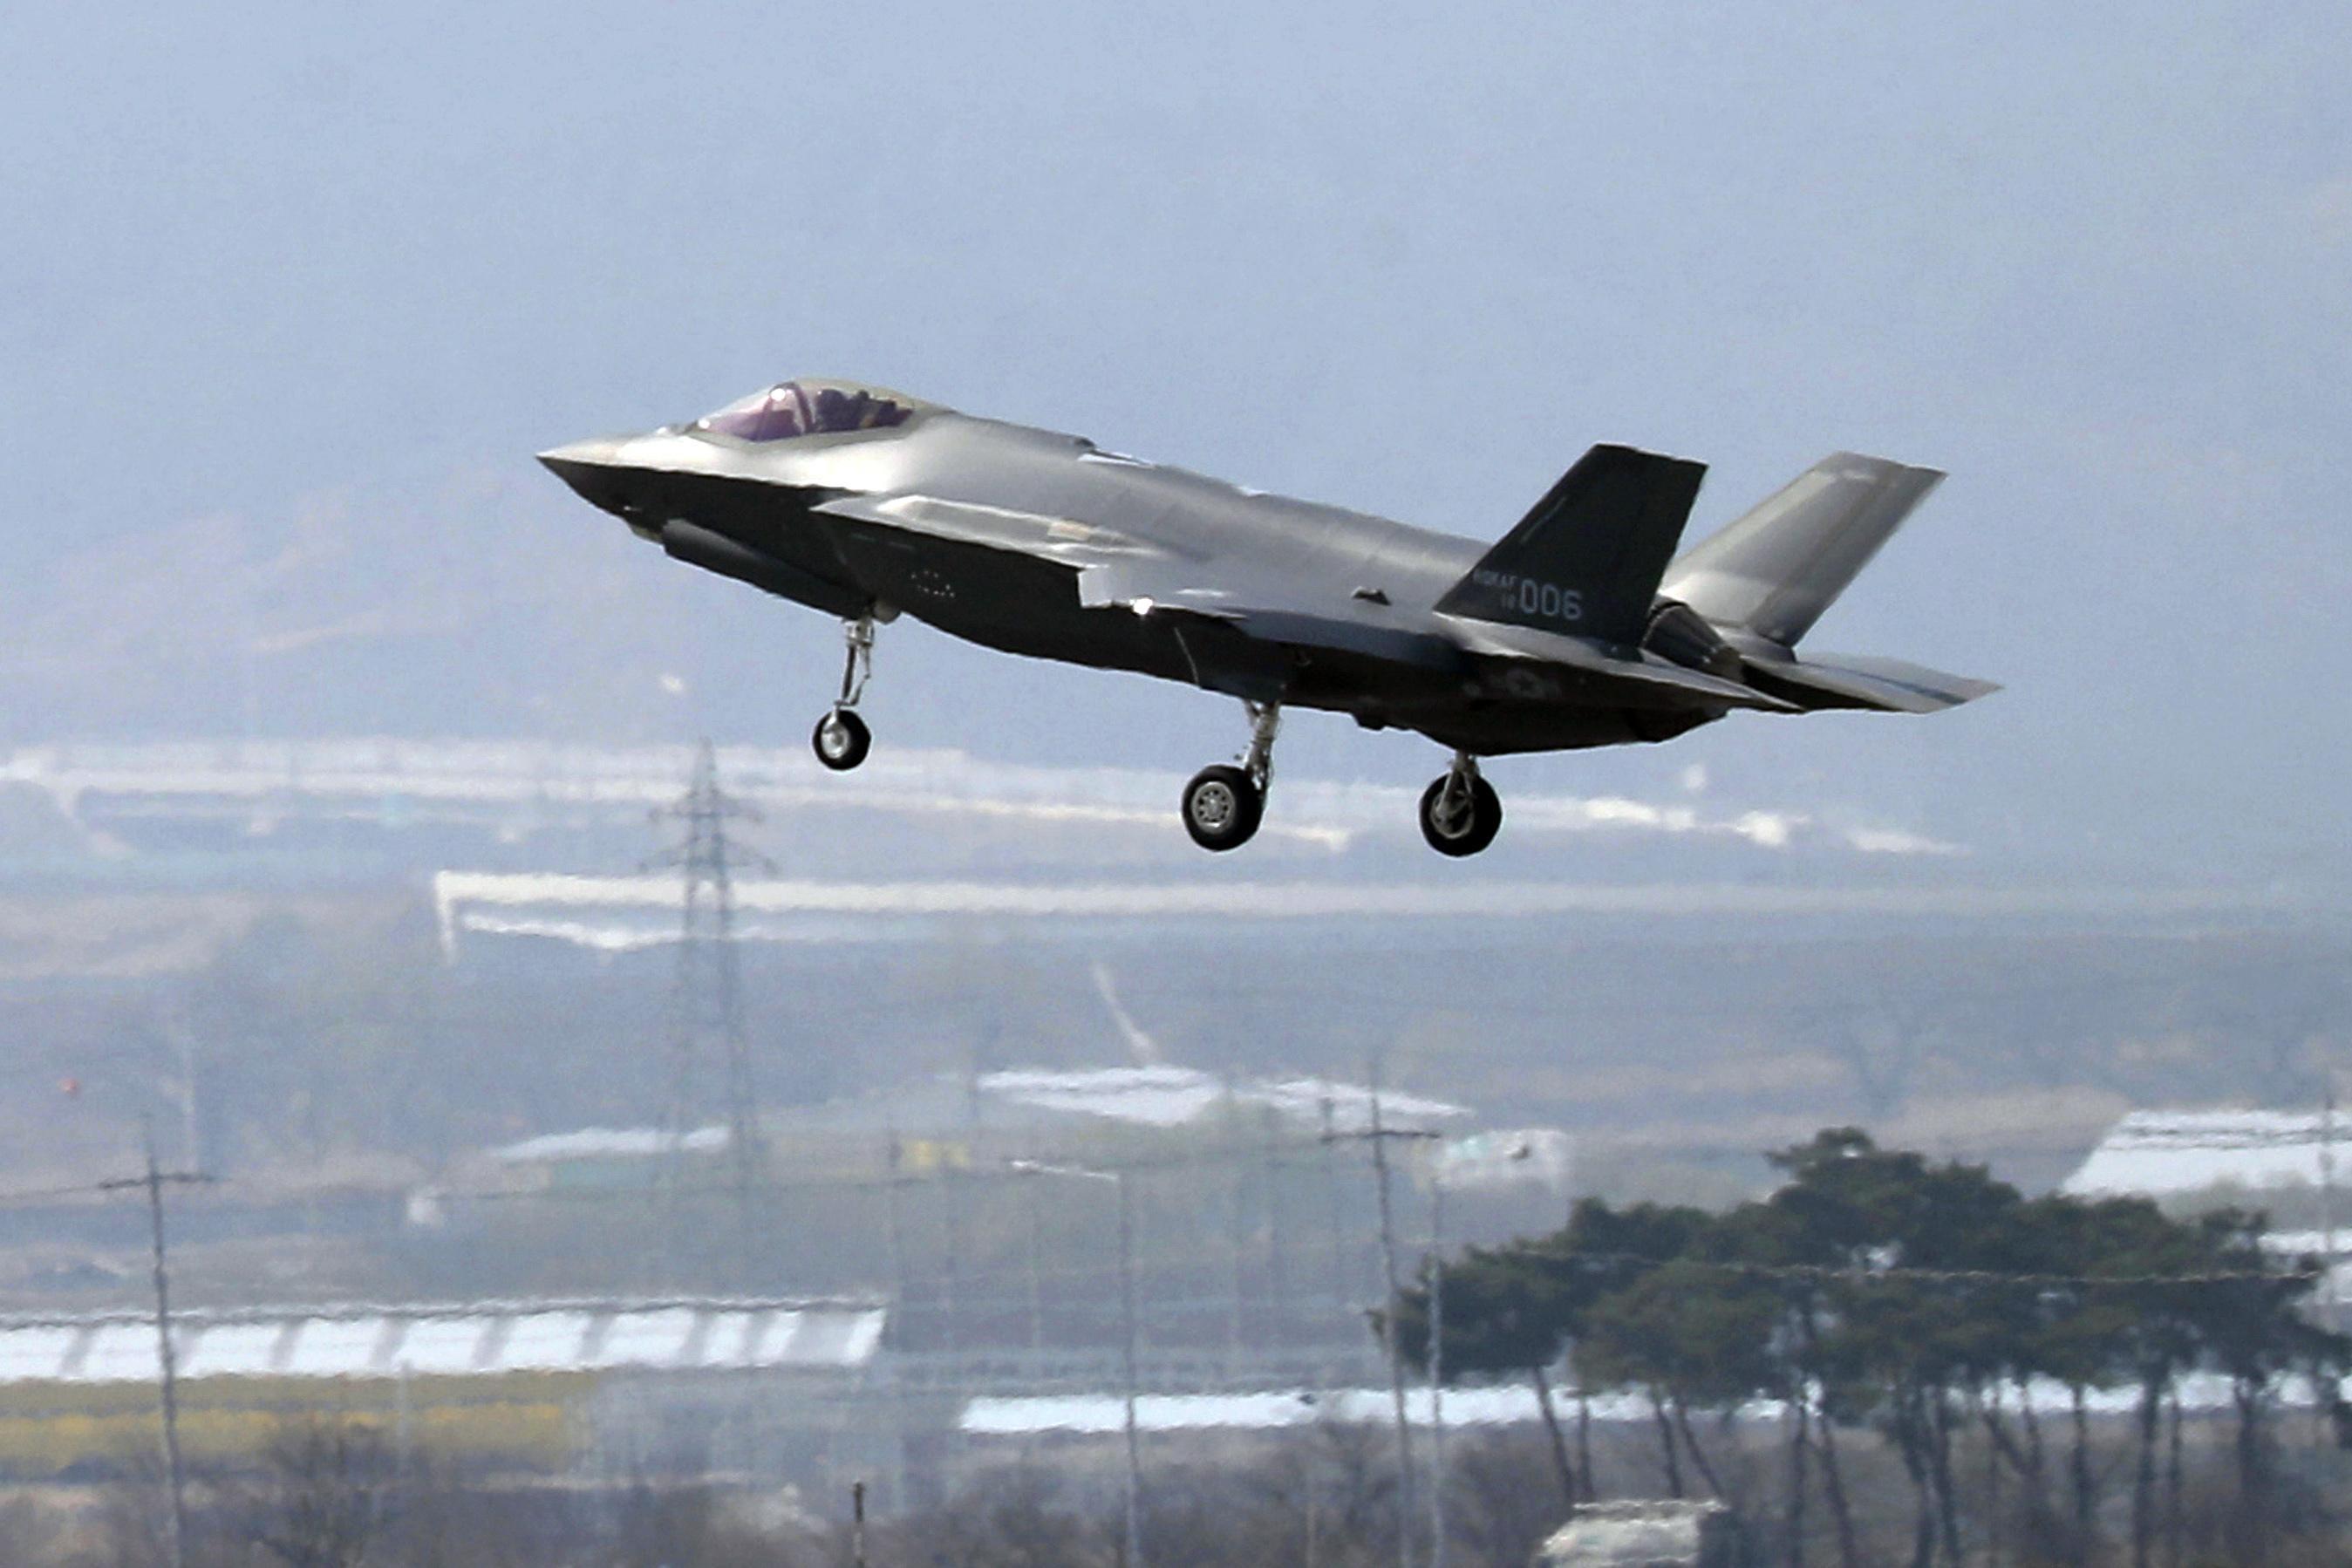 U.S. formally kicks Turkey out of F-35 program